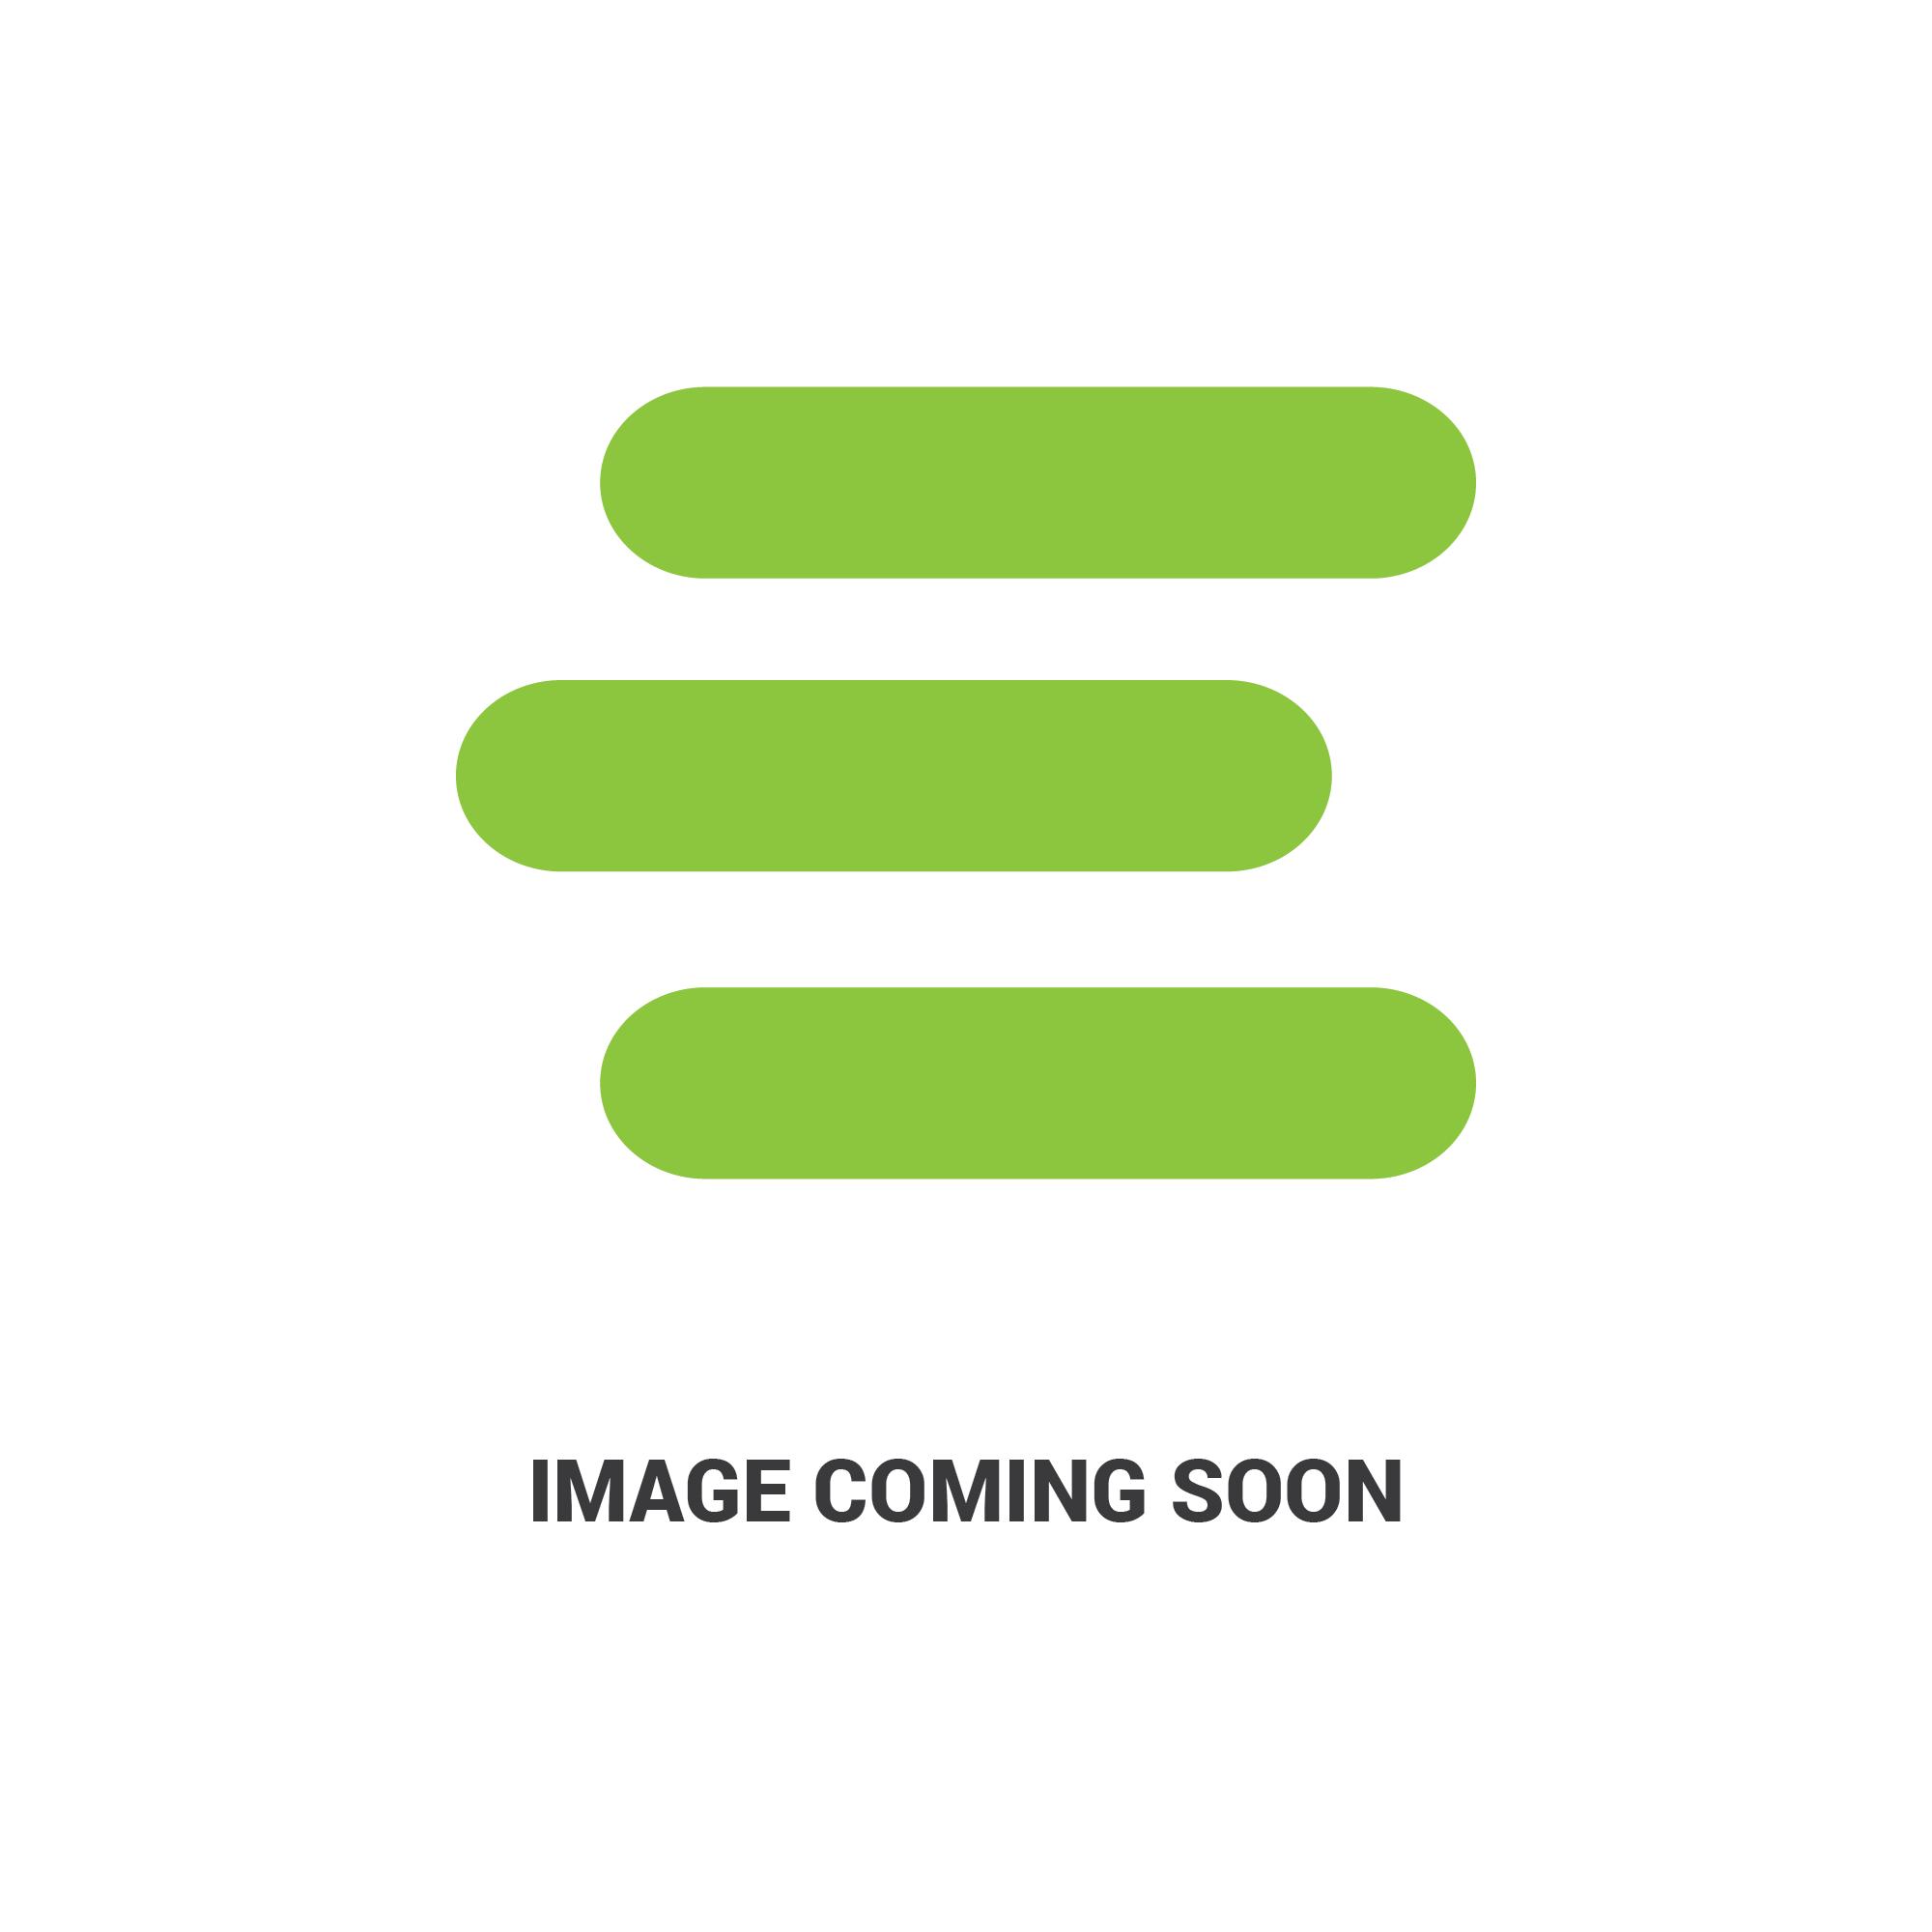 E-3C131-630701344_1.jpg